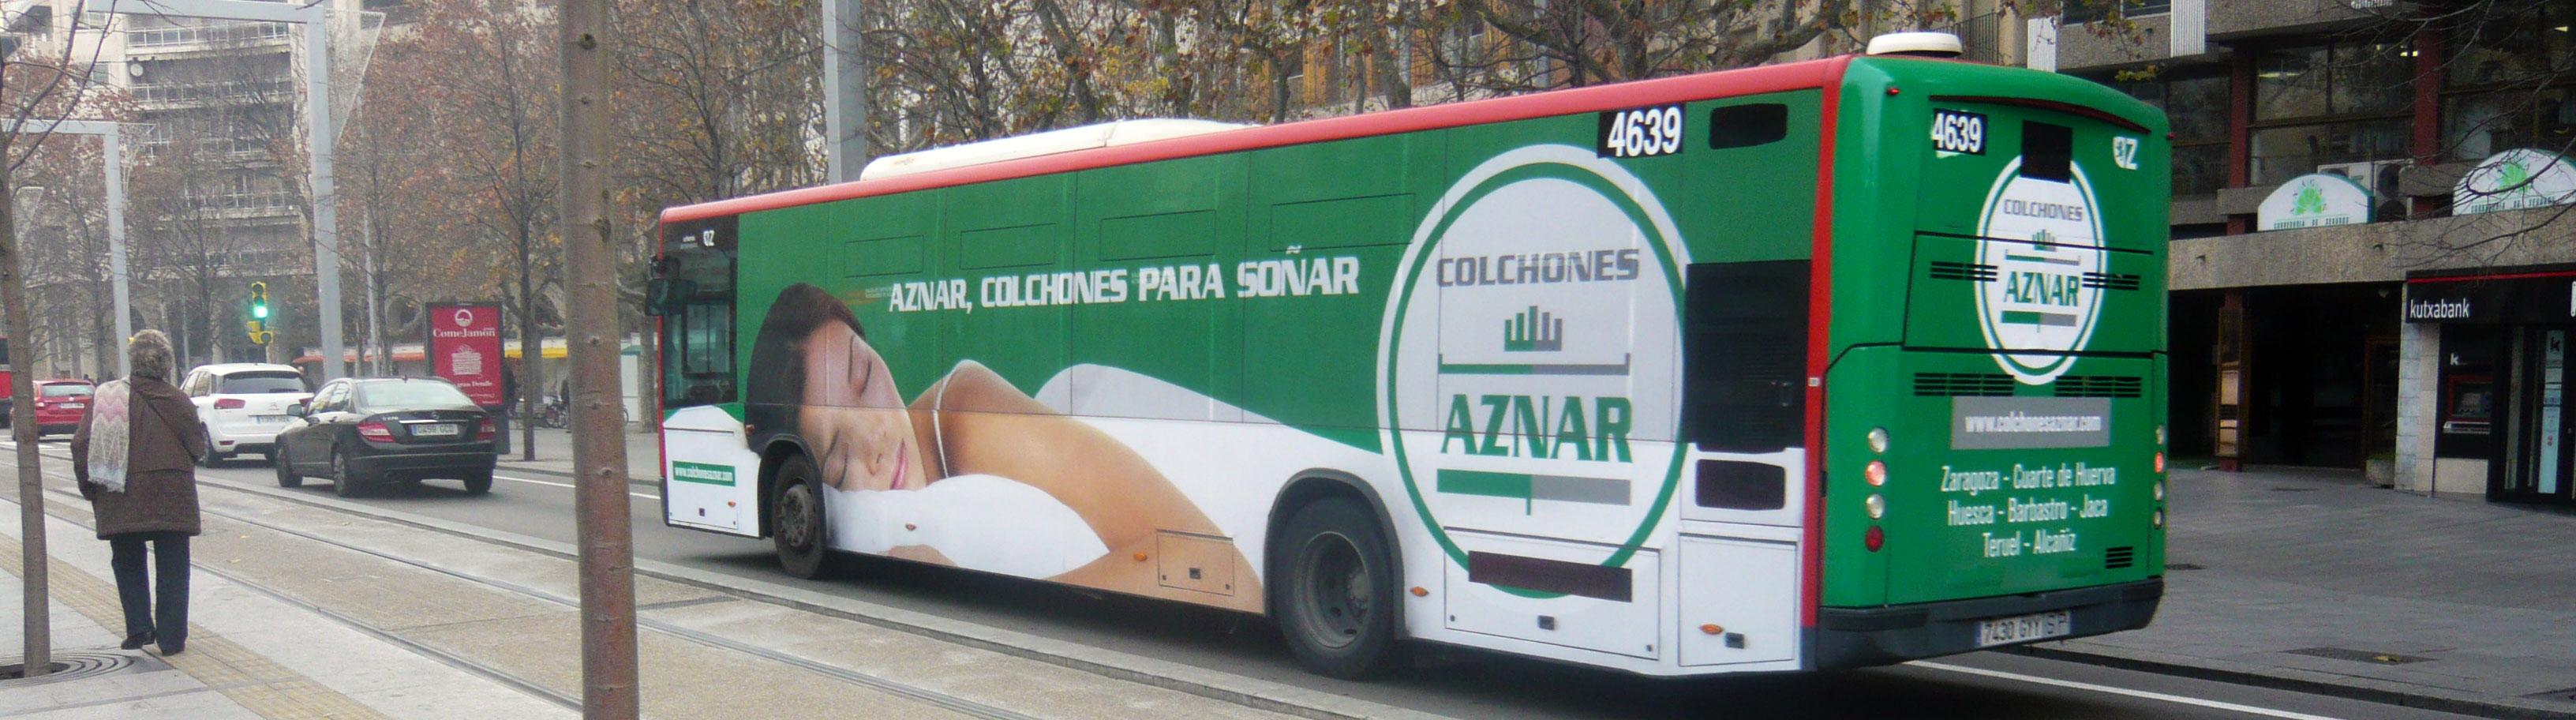 autobusAznar2